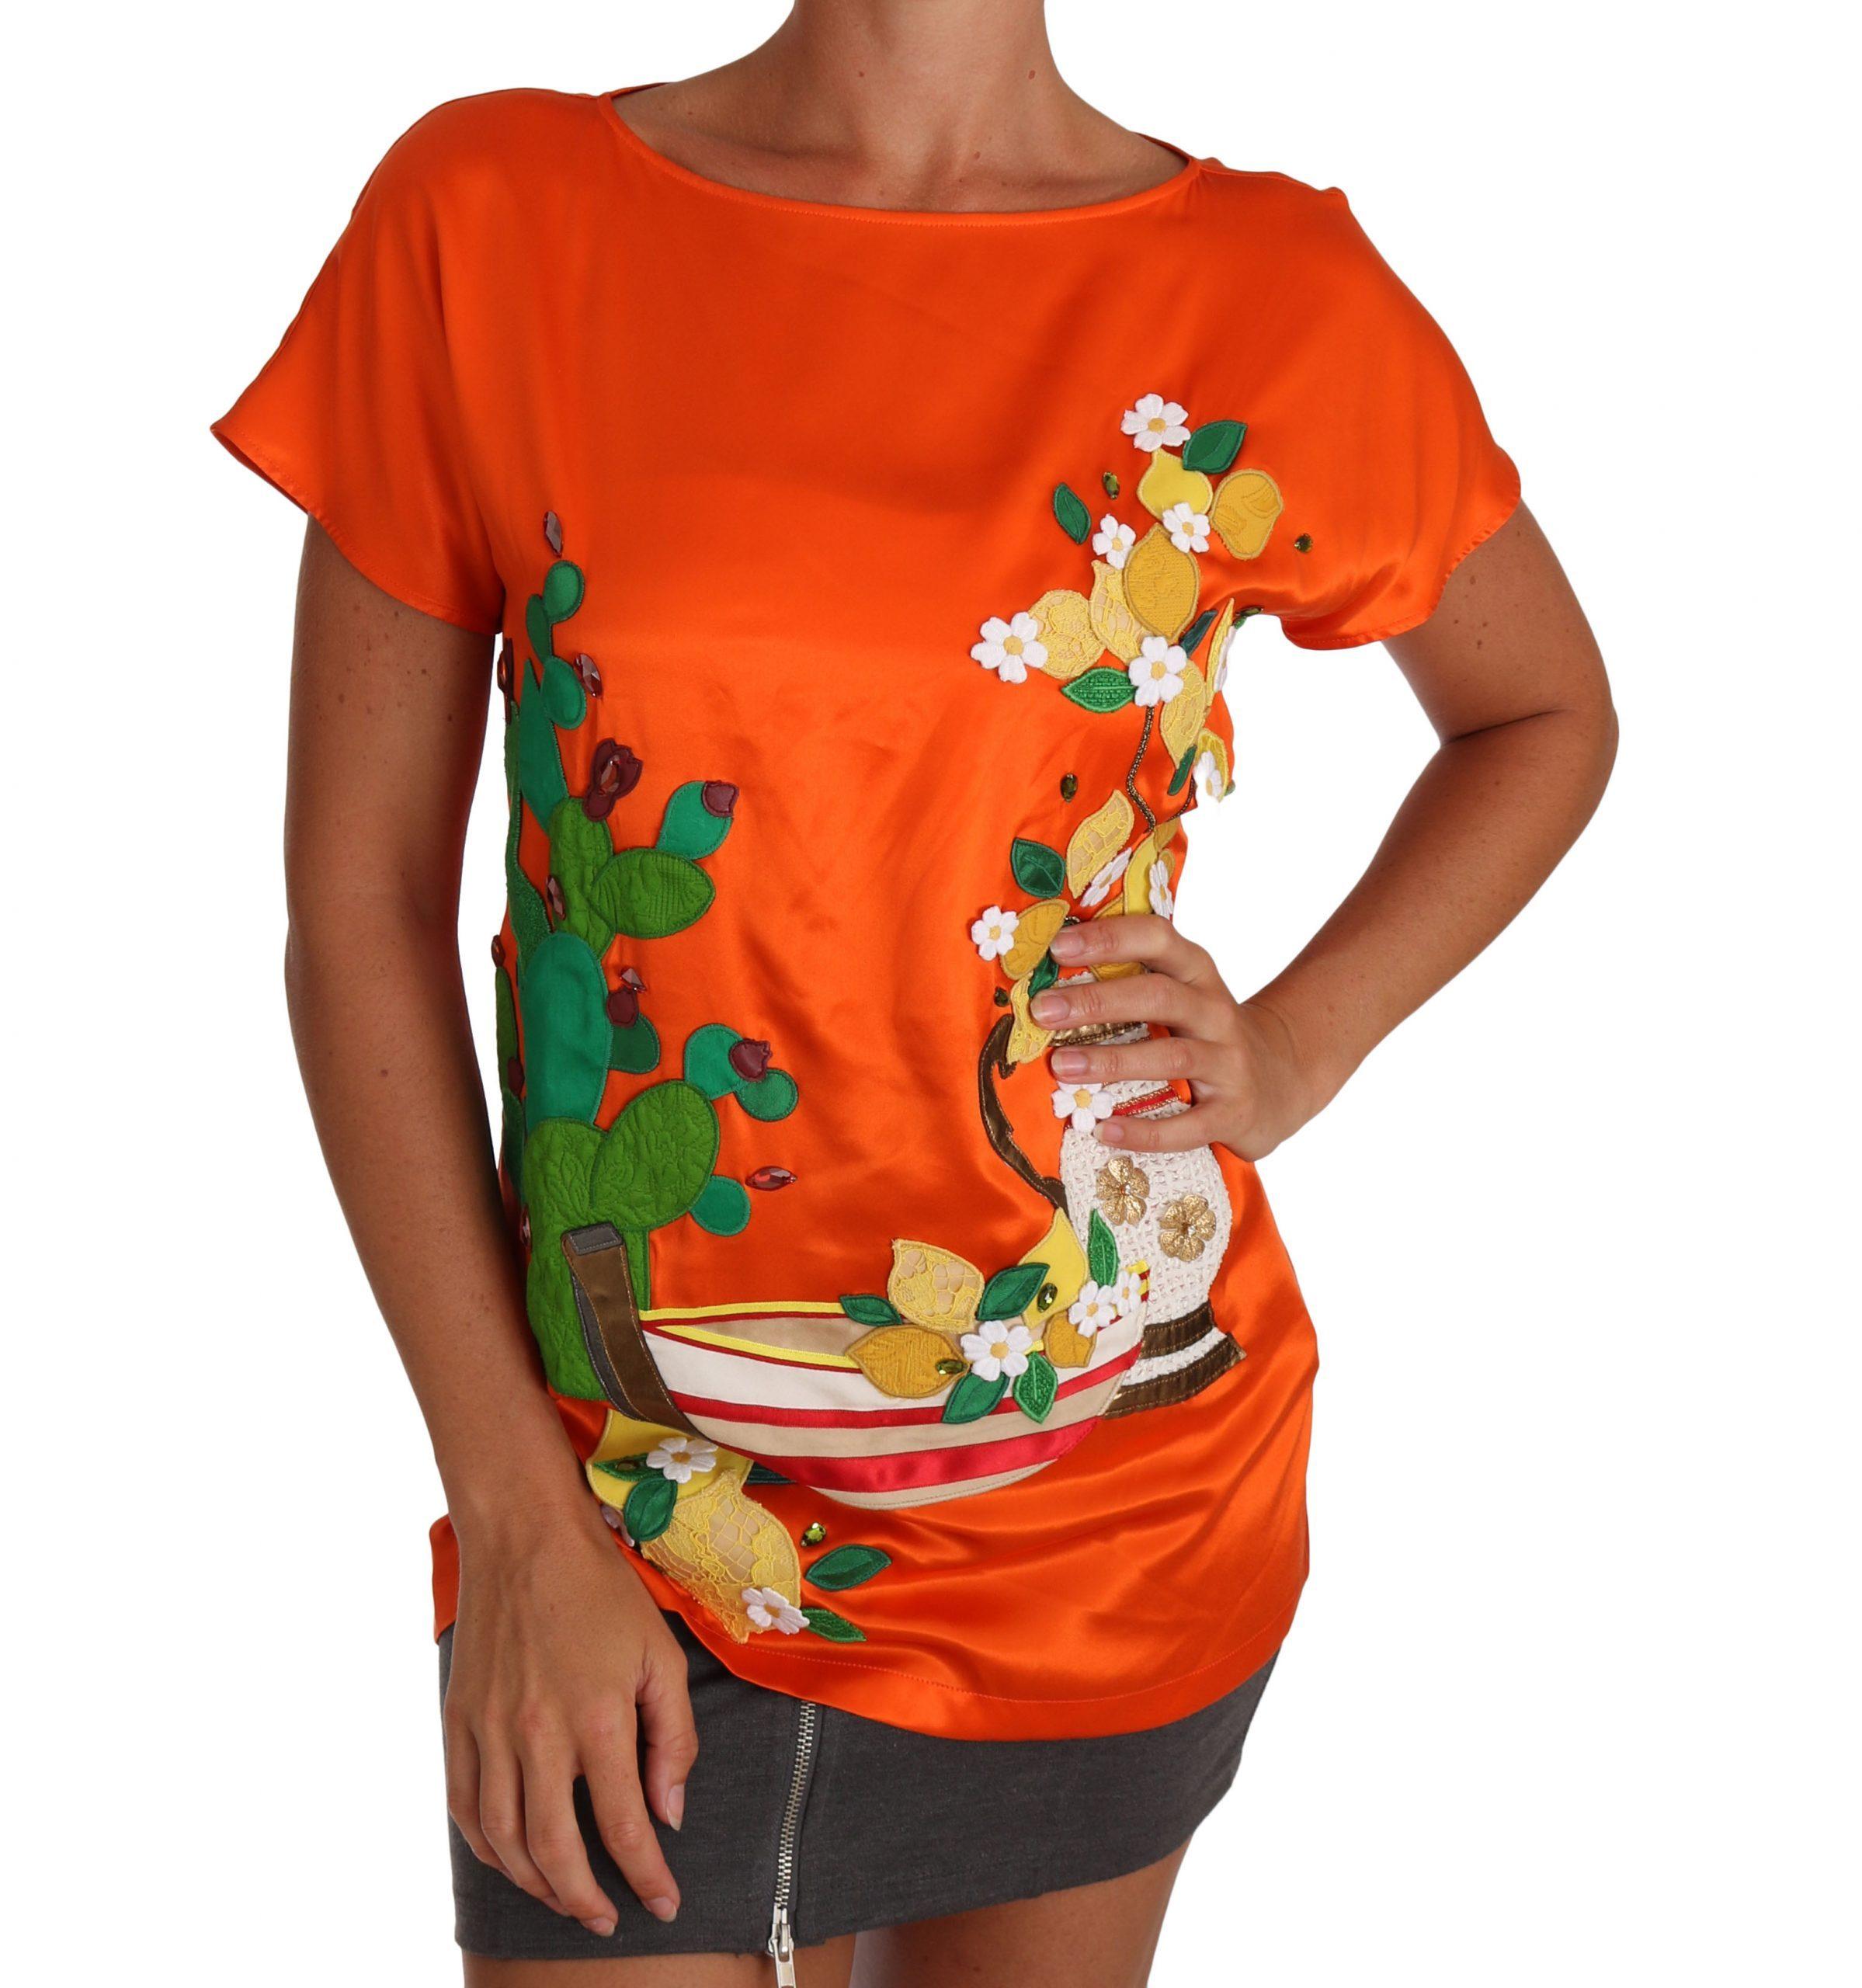 Dolce & Gabbana Women's Sicily Crystal T-Shirts Orange TSH2381 - IT36   XS